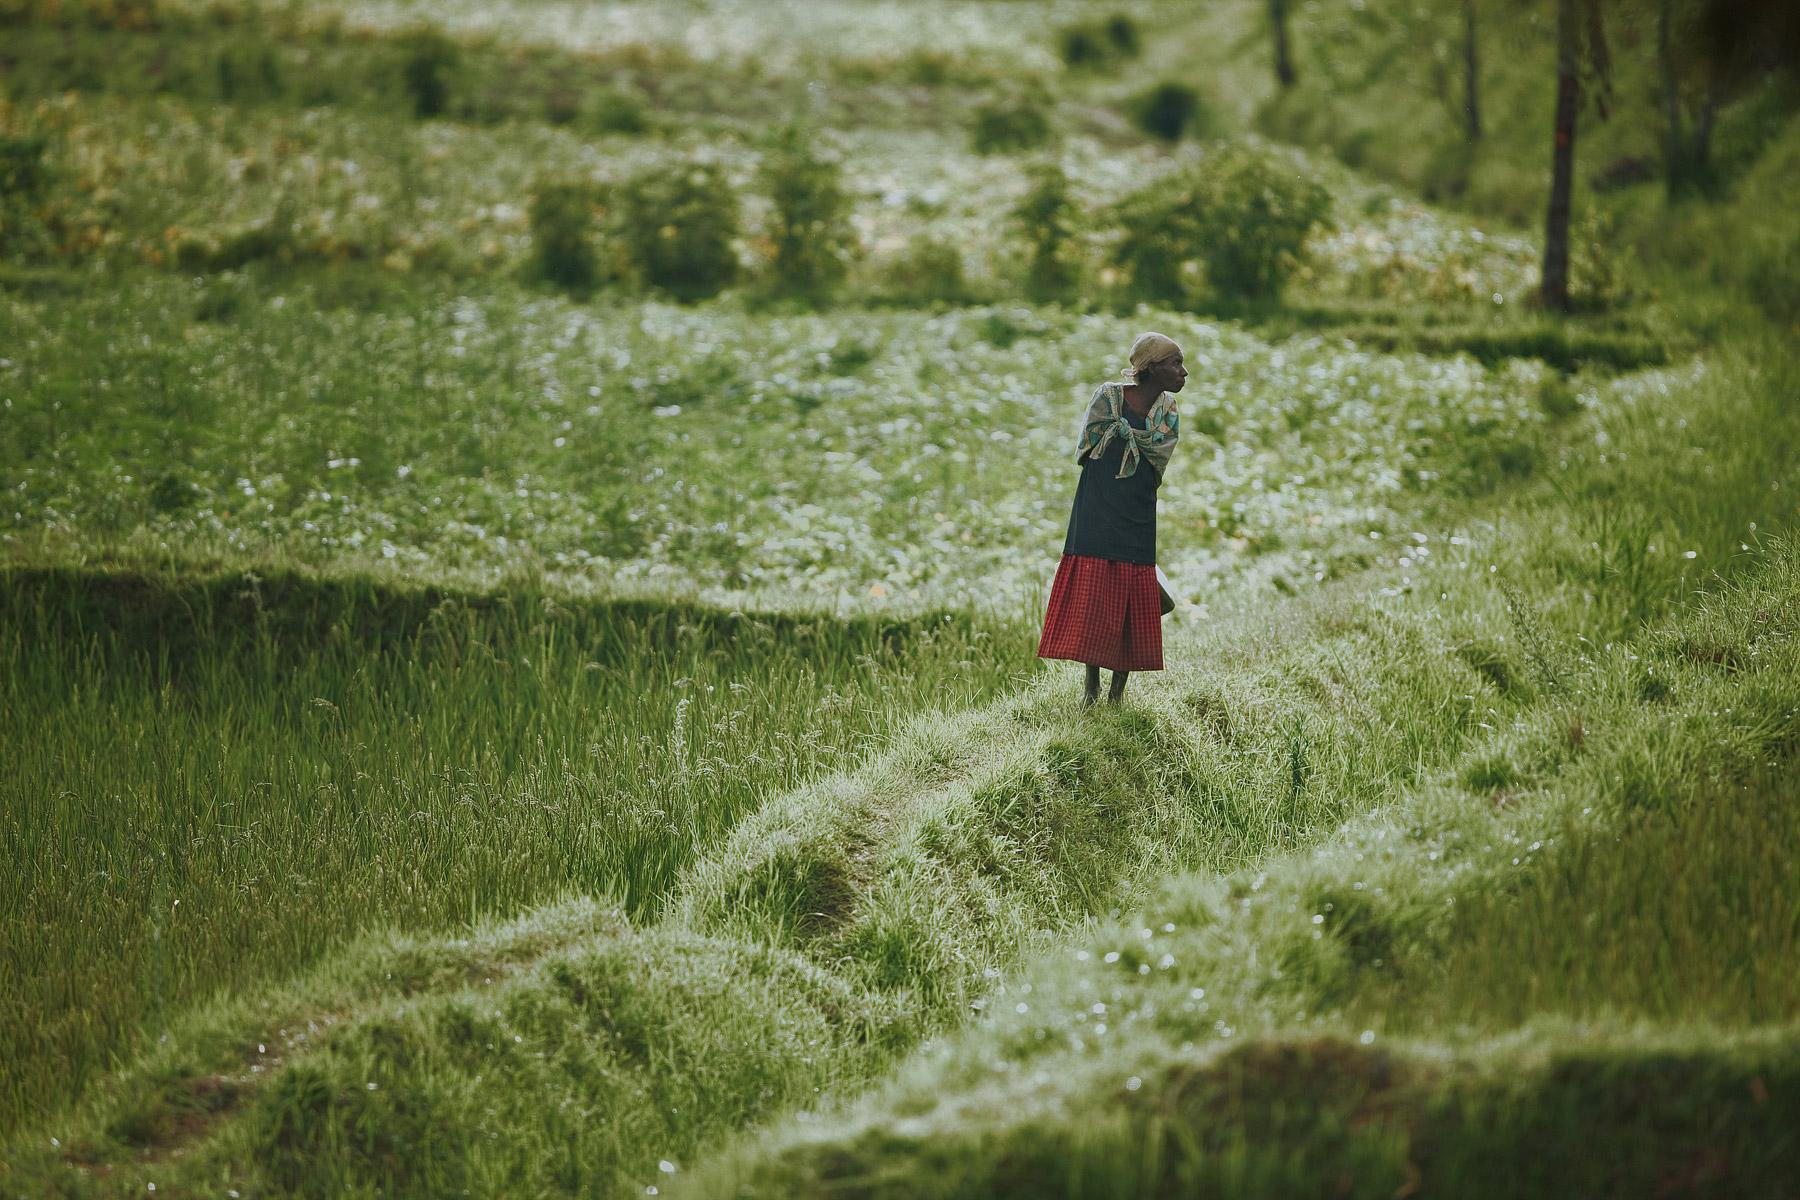 RWANDA_african_woman_standing_field_agriculture